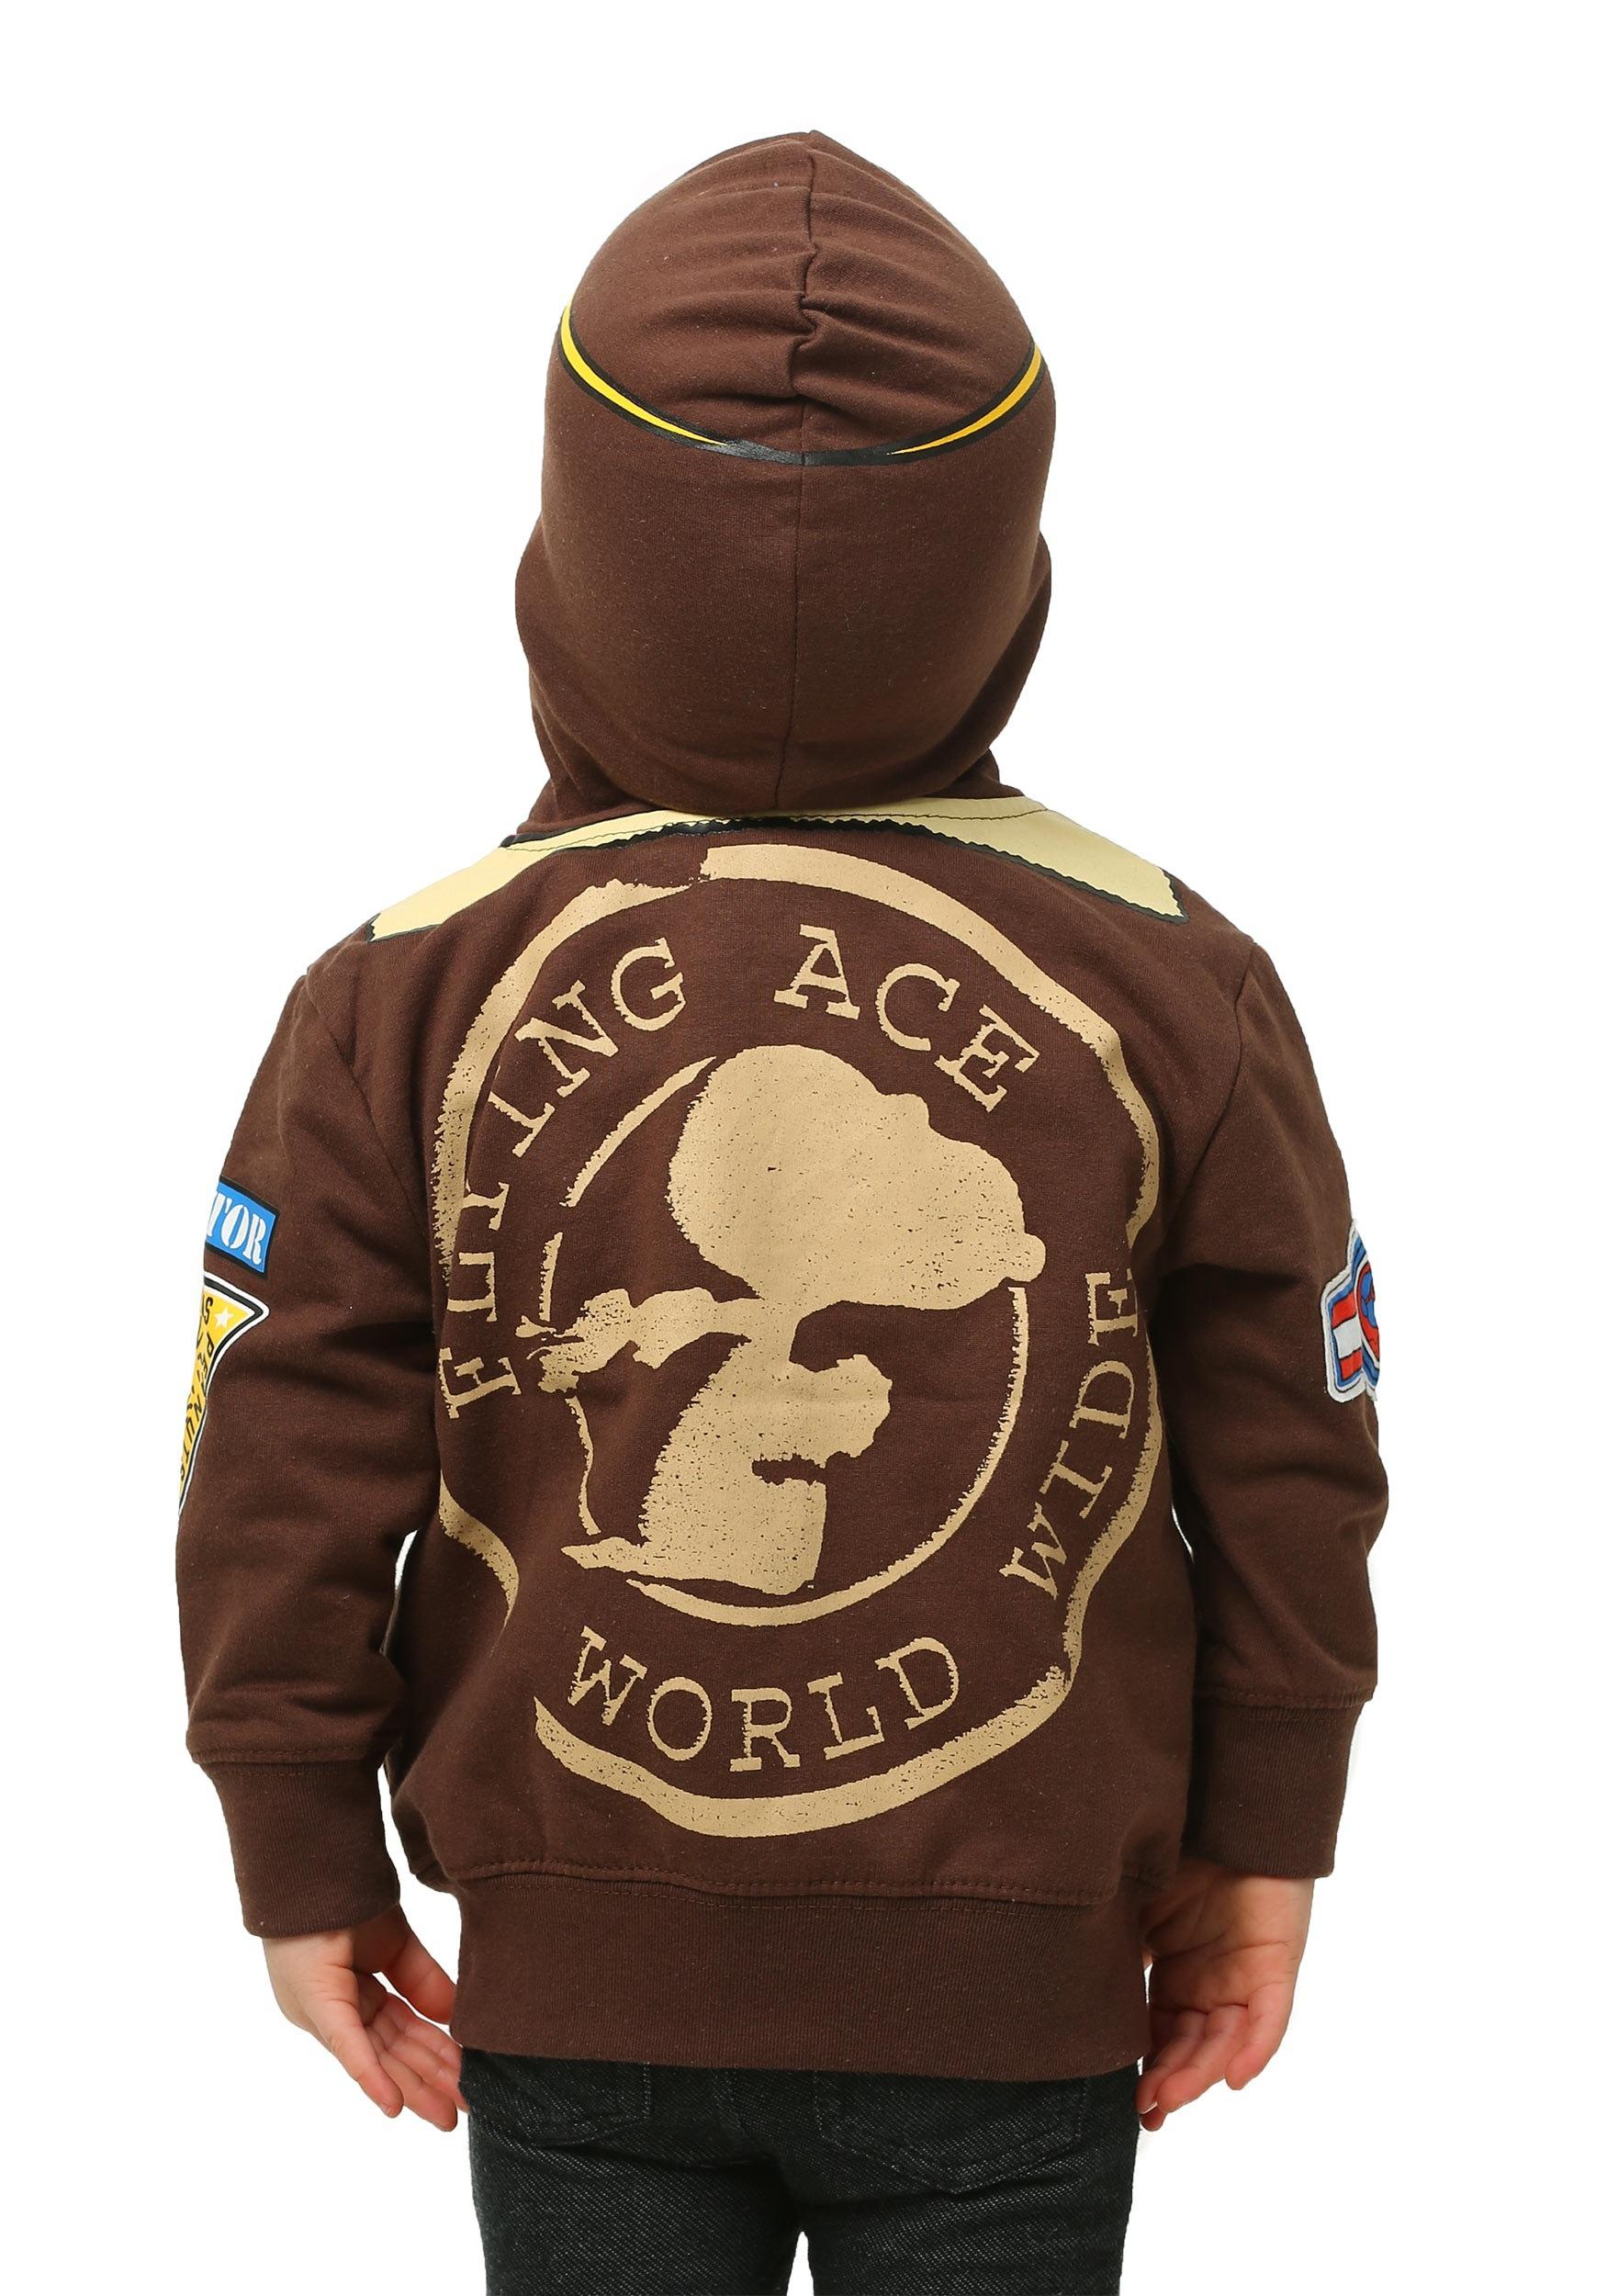 4b2b16cb Peanuts Toddler Boys Snoopy Bomber Jacket Hooded Sweatshirt